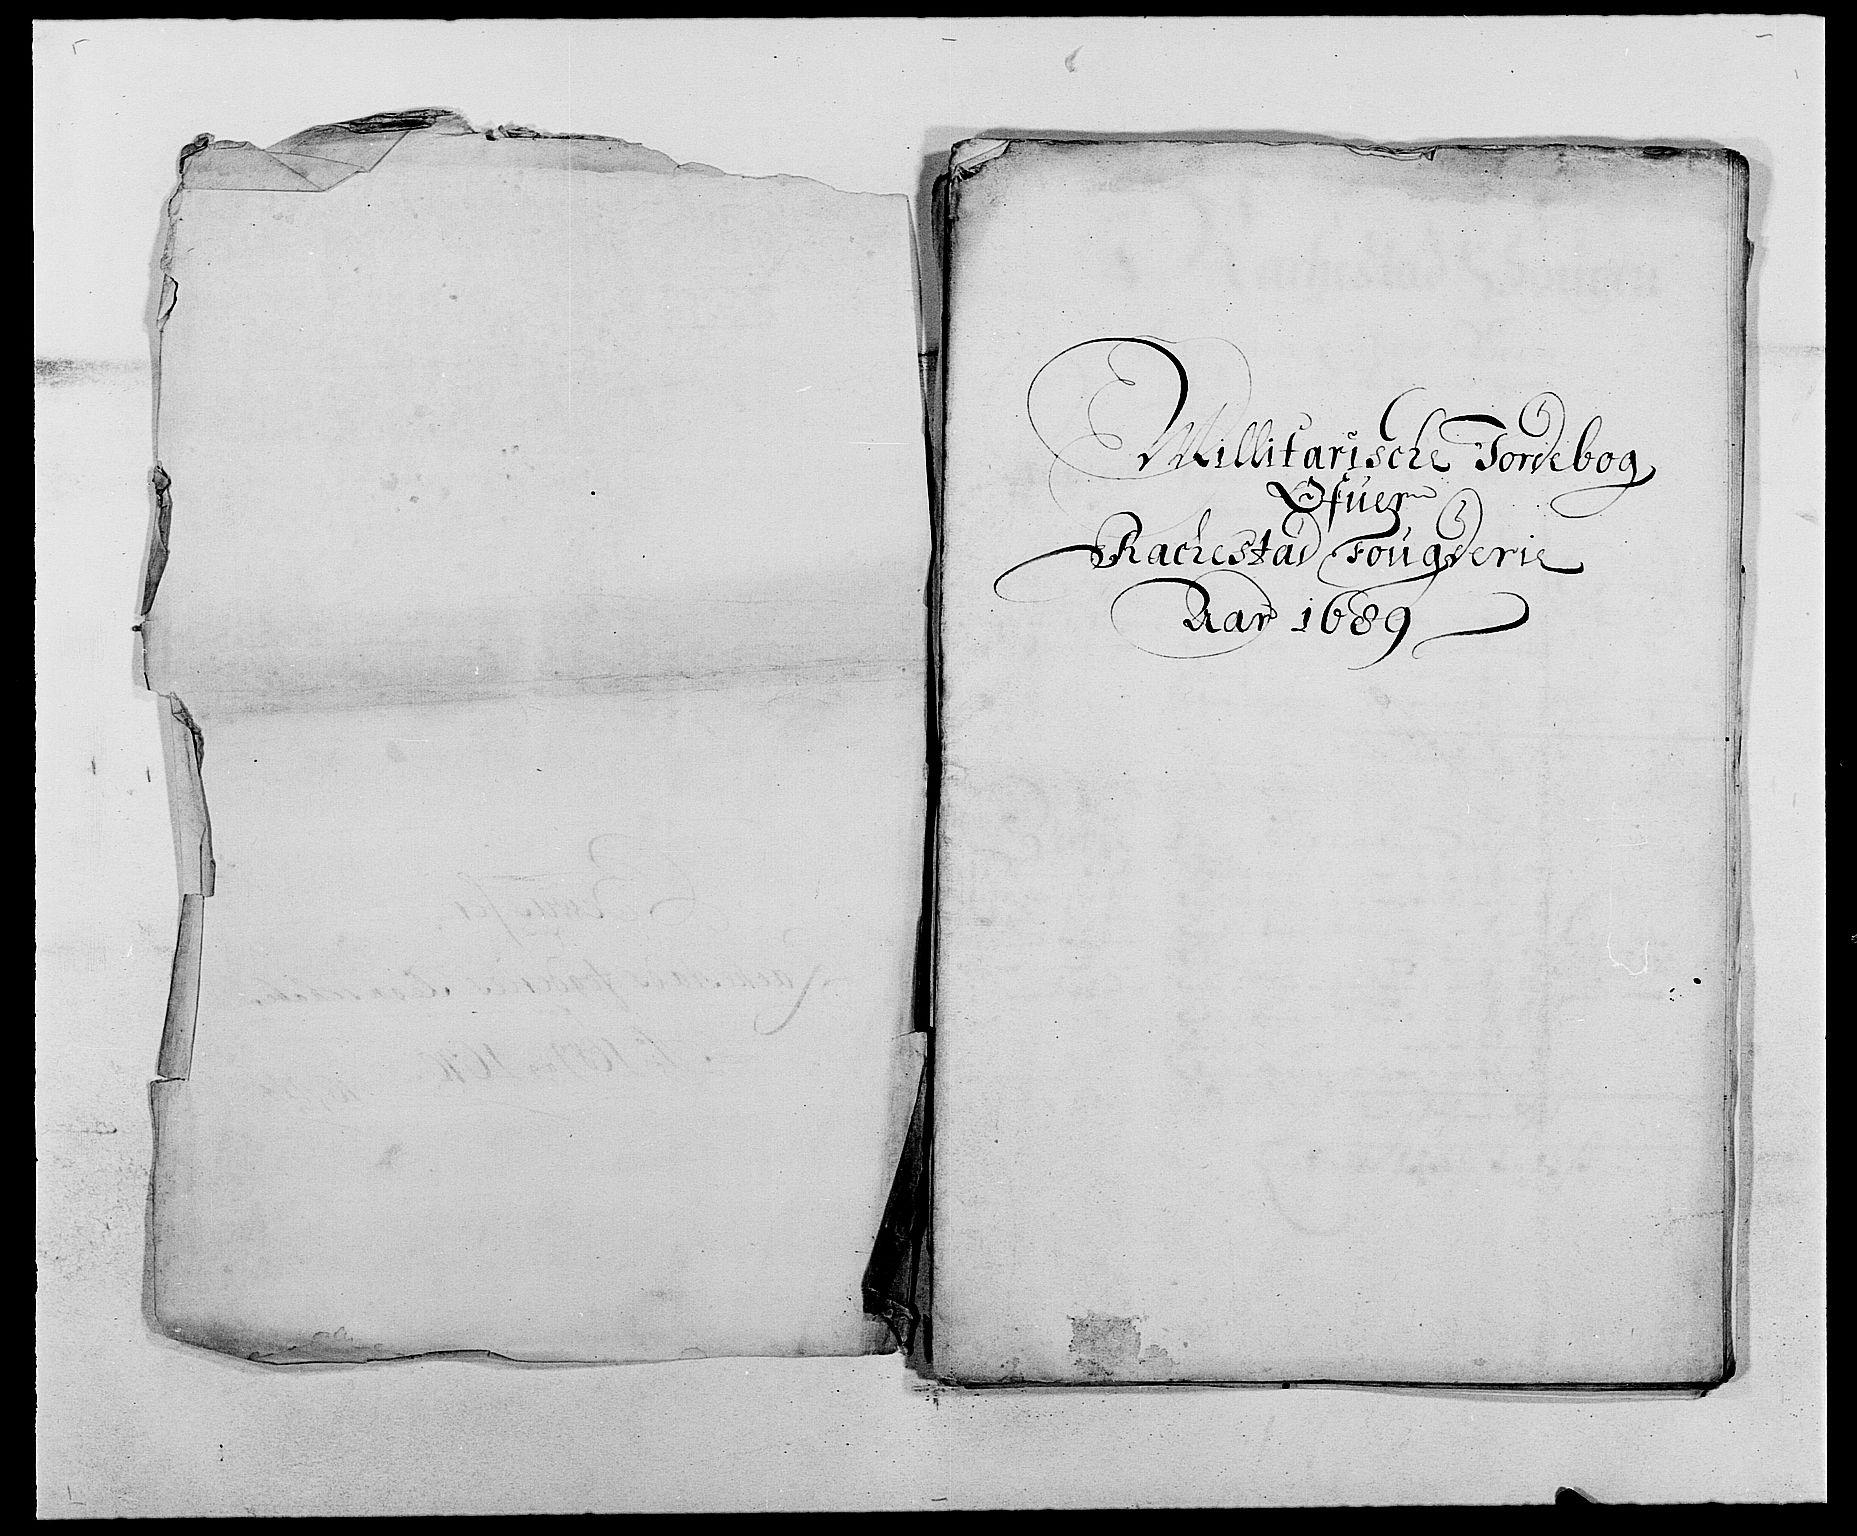 RA, Rentekammeret inntil 1814, Reviderte regnskaper, Fogderegnskap, R05/L0277: Fogderegnskap Rakkestad, 1689-1690, s. 320